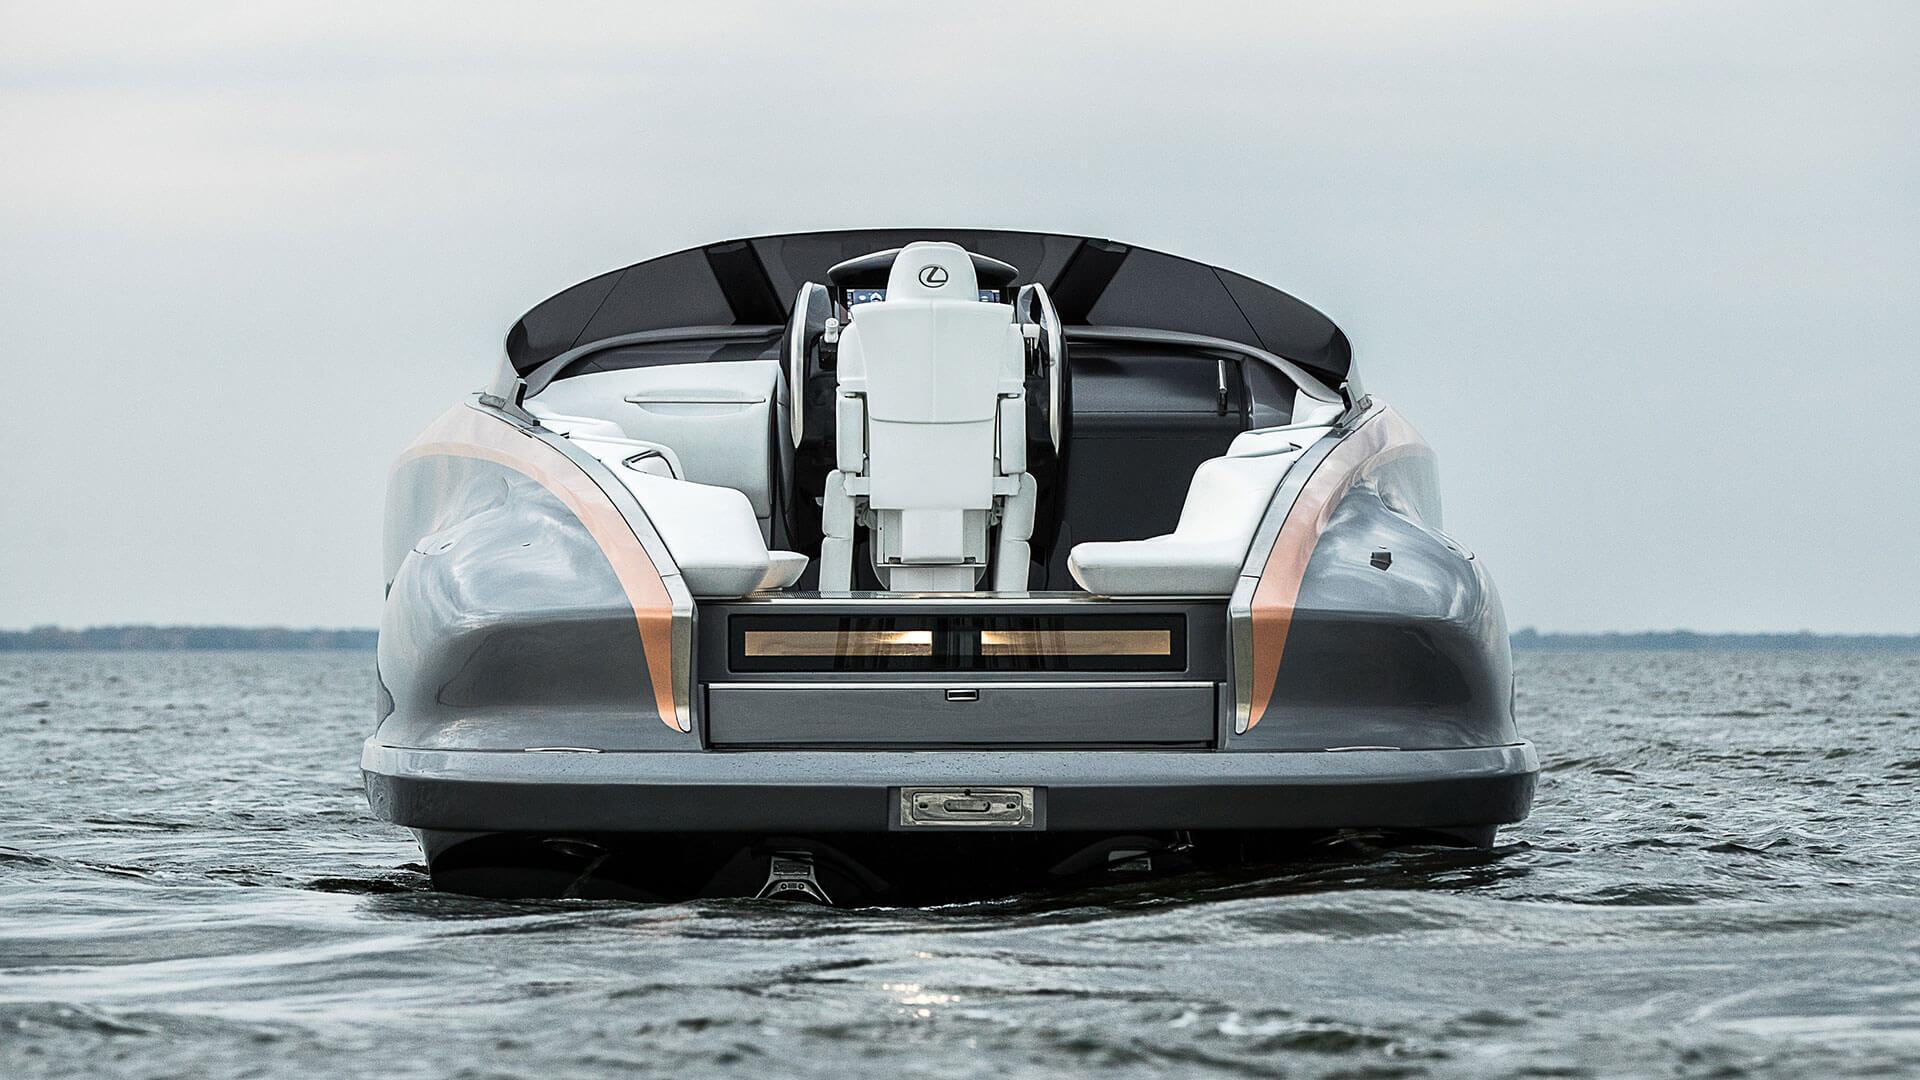 2017 lexus yacht gallery06